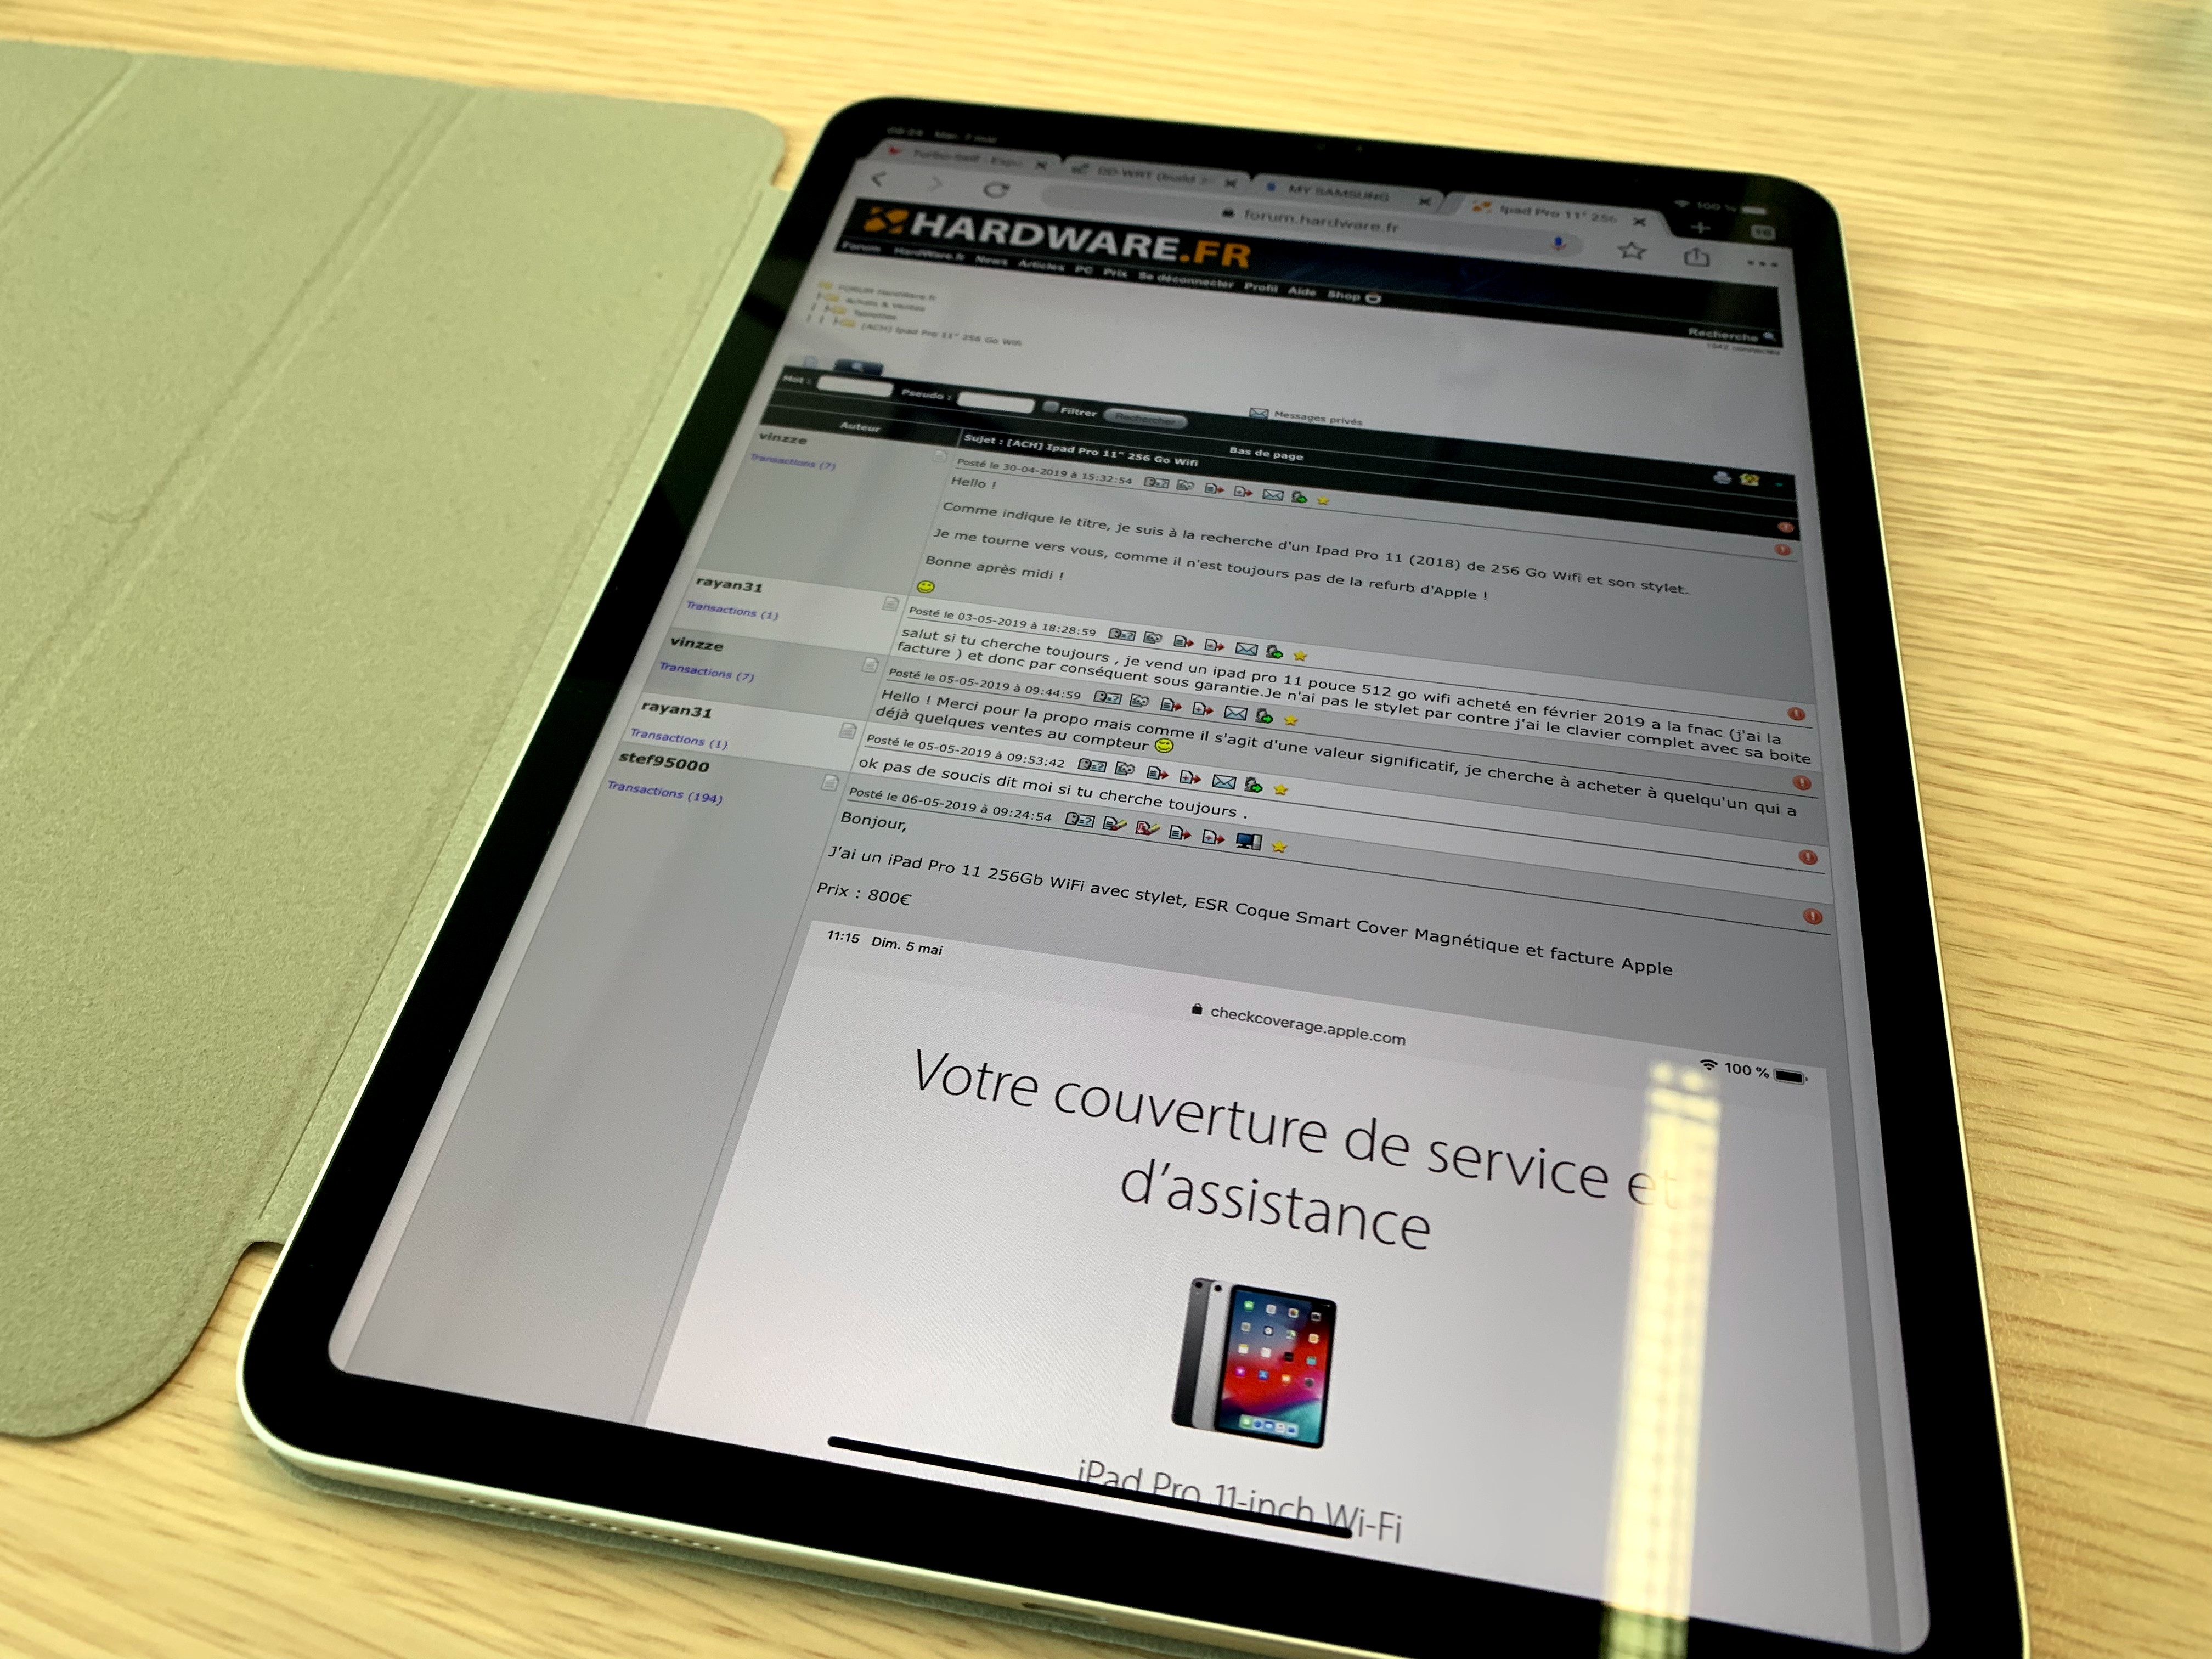 https://photo.swebserver.fr/Photos%20iPad/IMG_0100.jpg